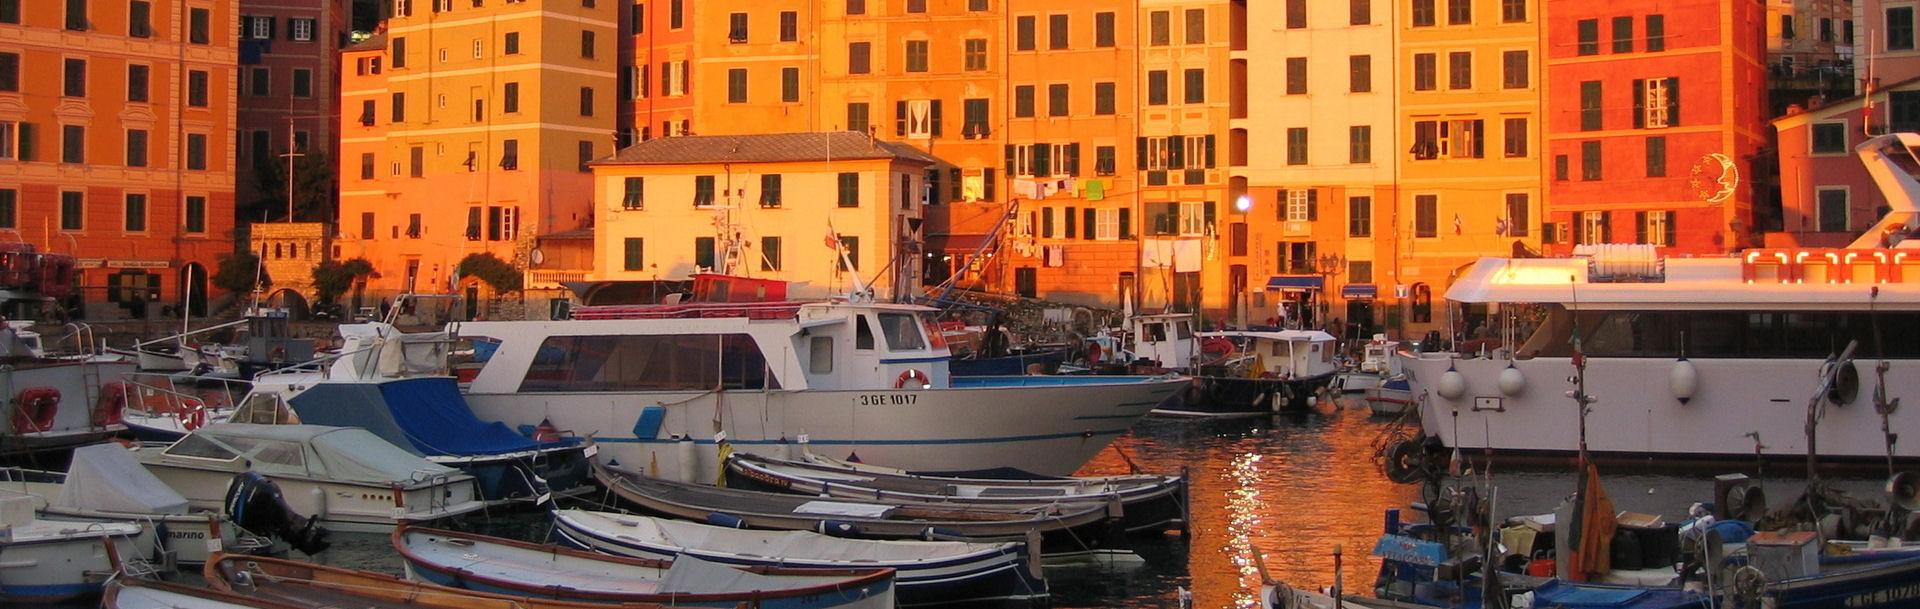 Camogli-porto